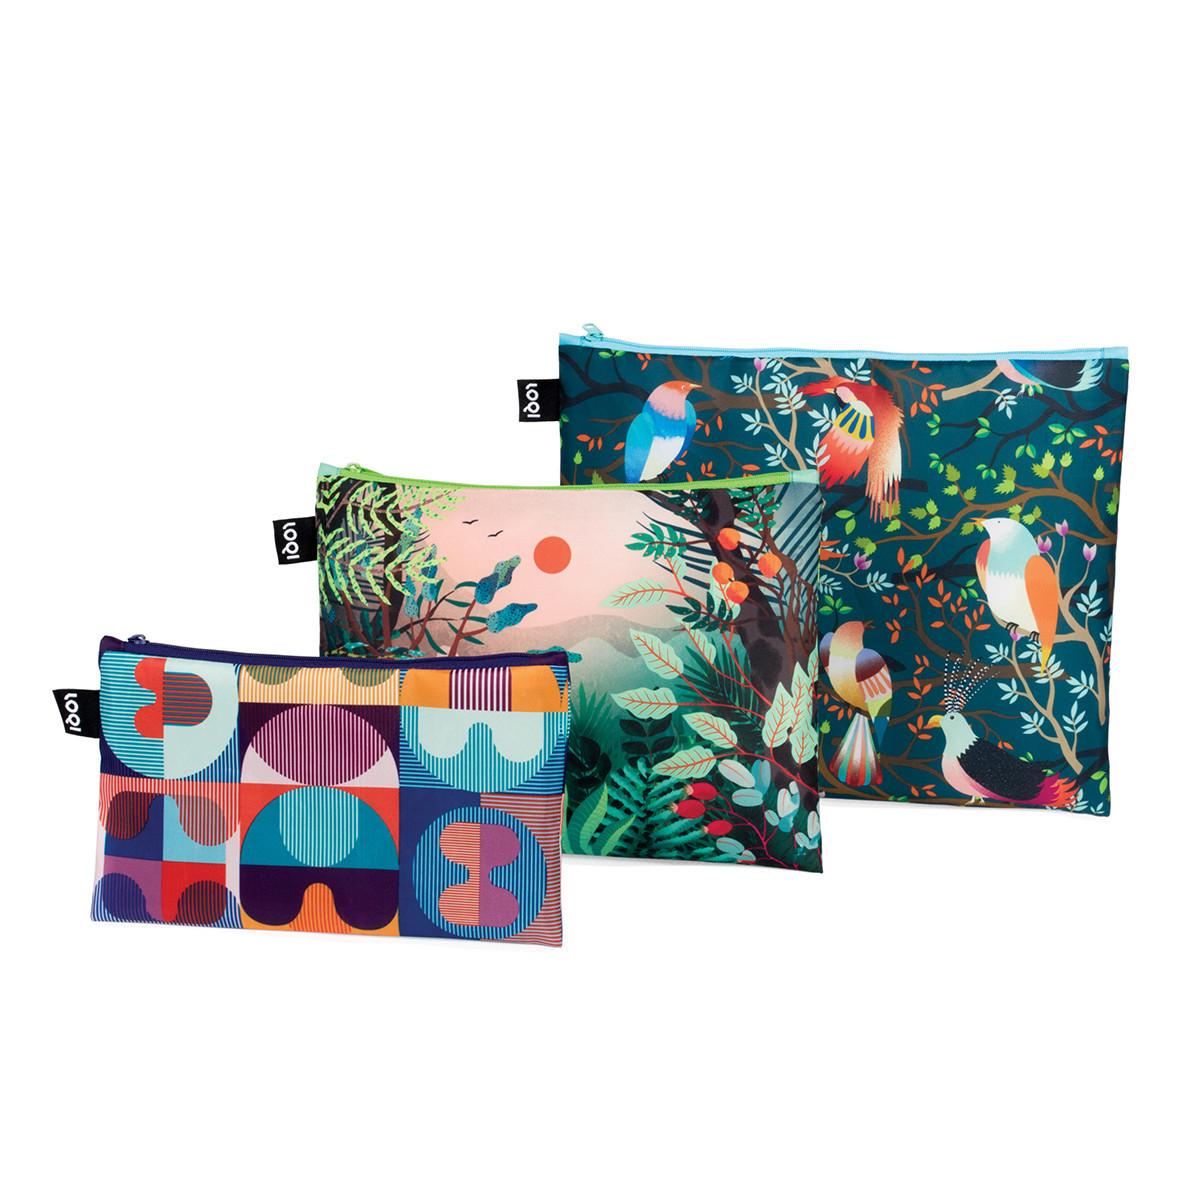 Zip Pocket (Set Of 3) Hvass & Hannibal Collection image